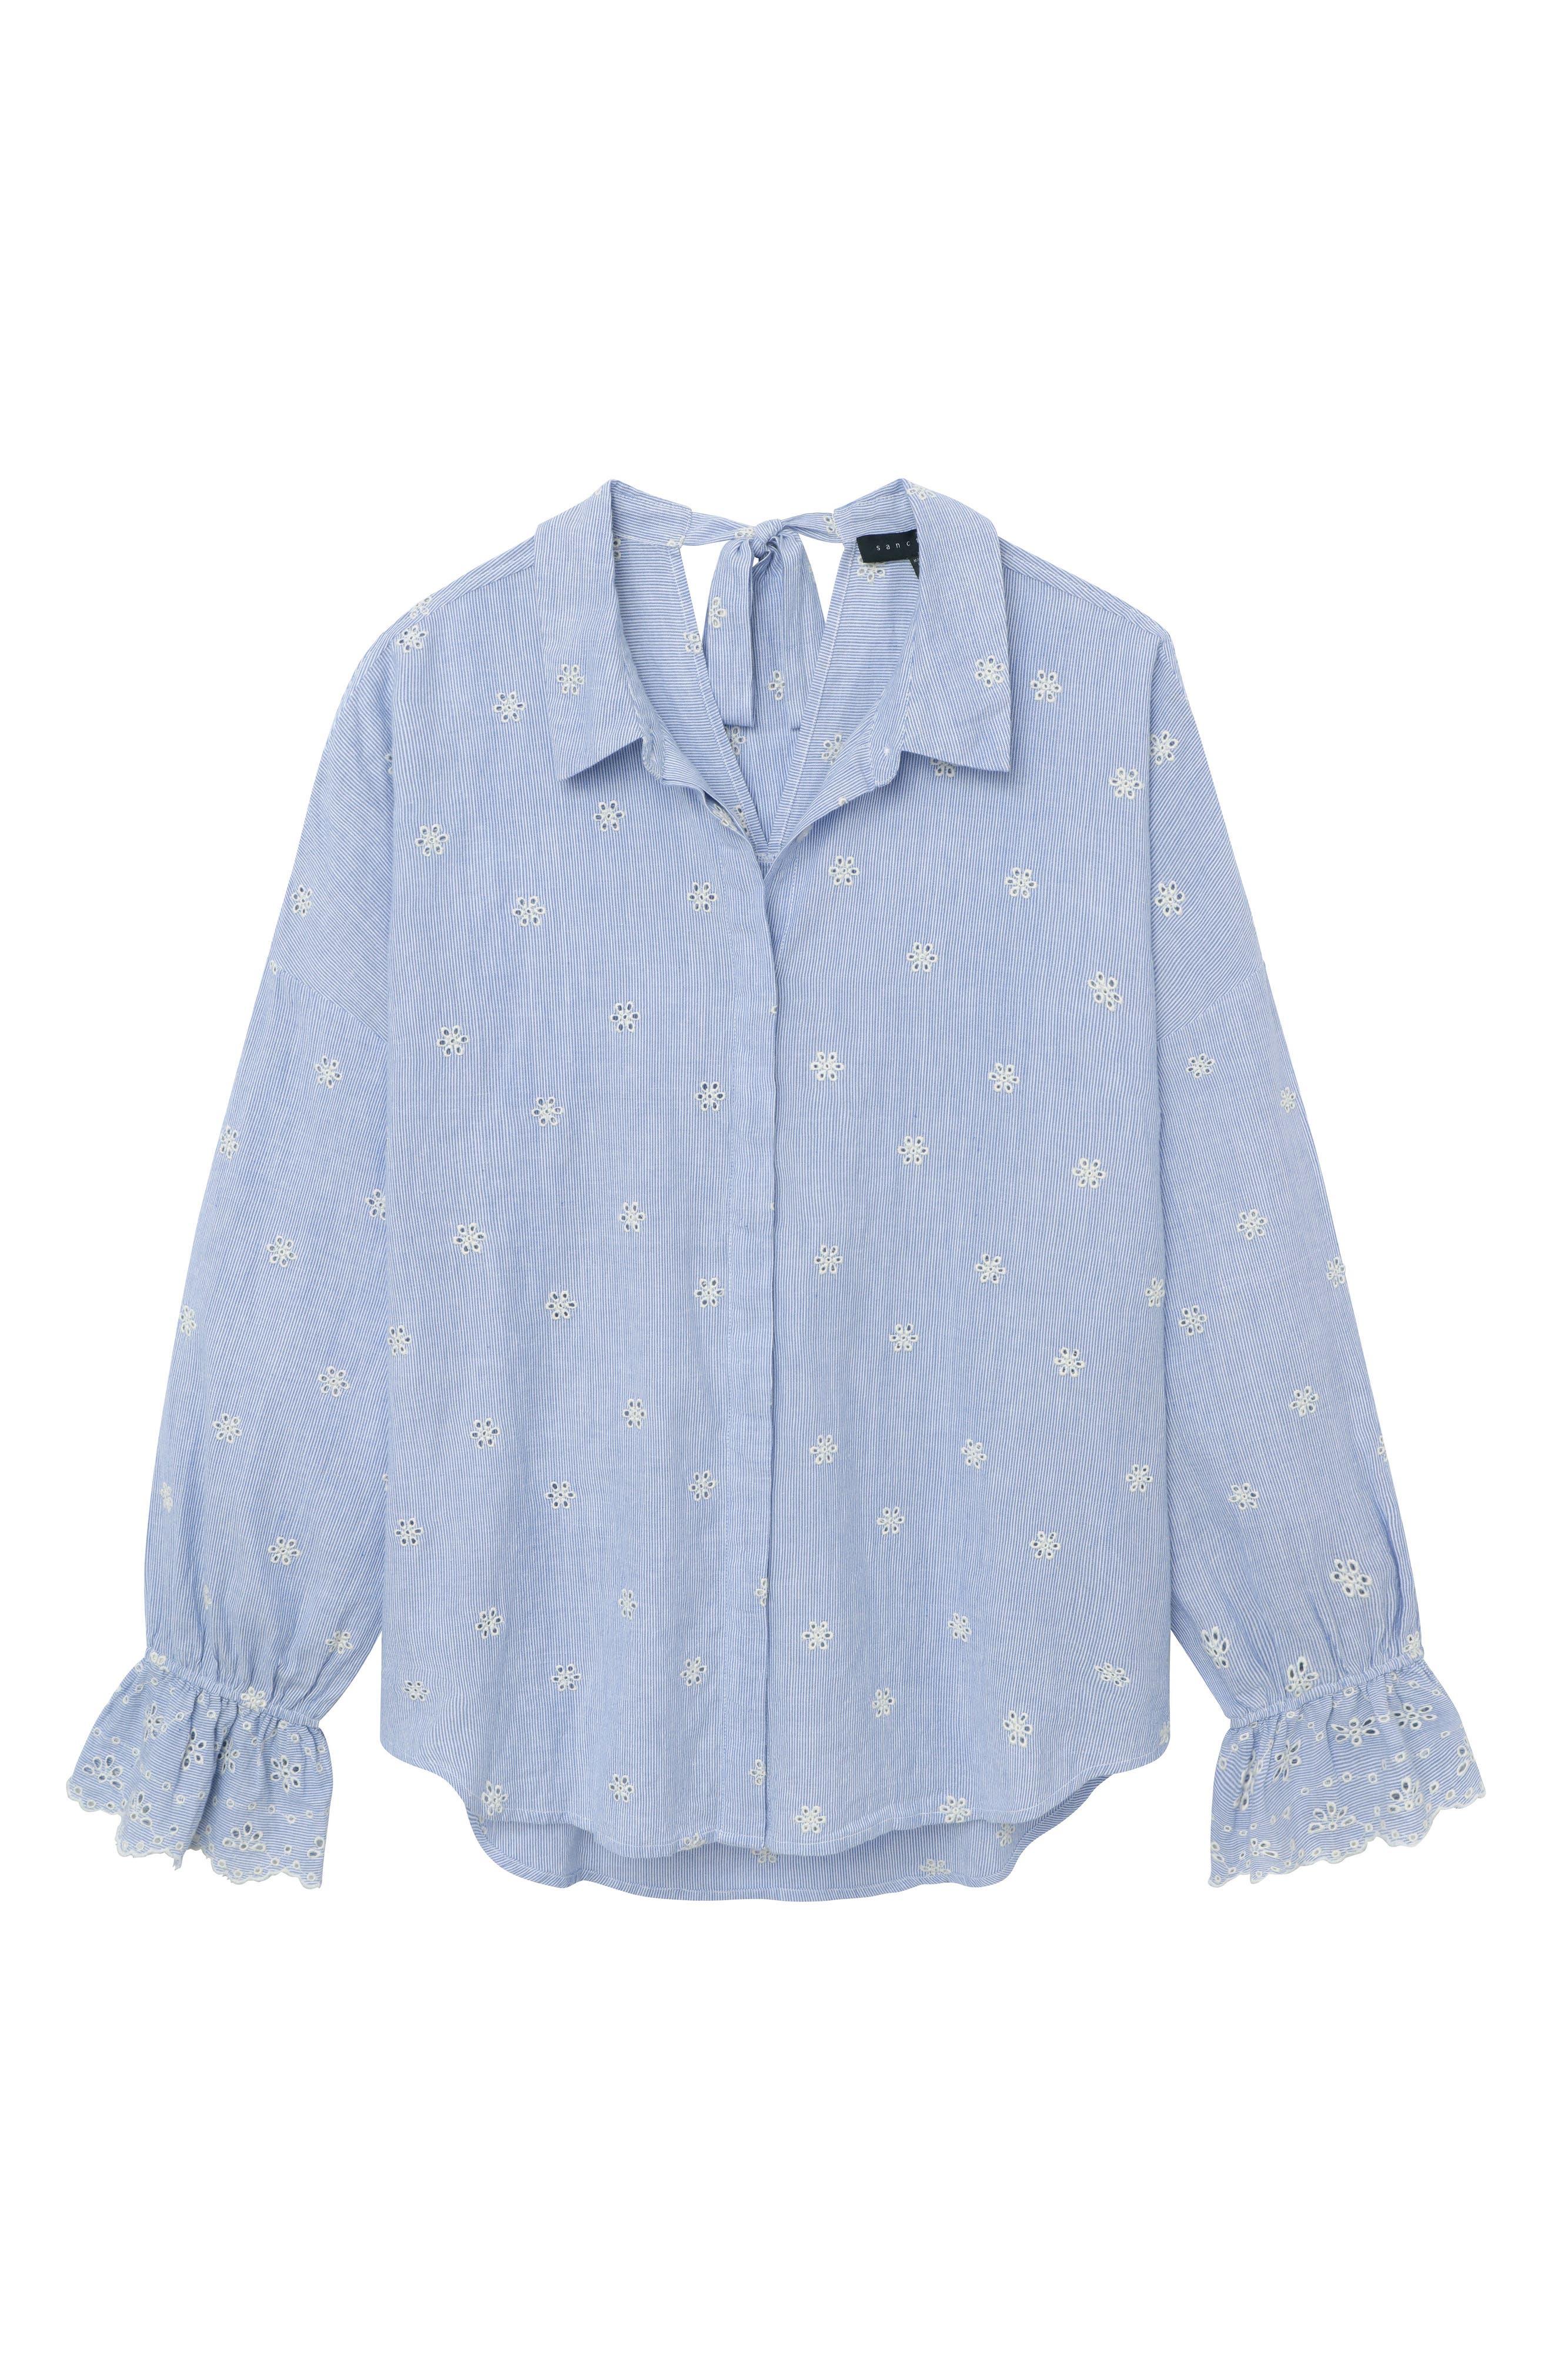 Hazel Boy Eyelet Shirt,                             Alternate thumbnail 3, color,                             BABY TICKING STRIPE